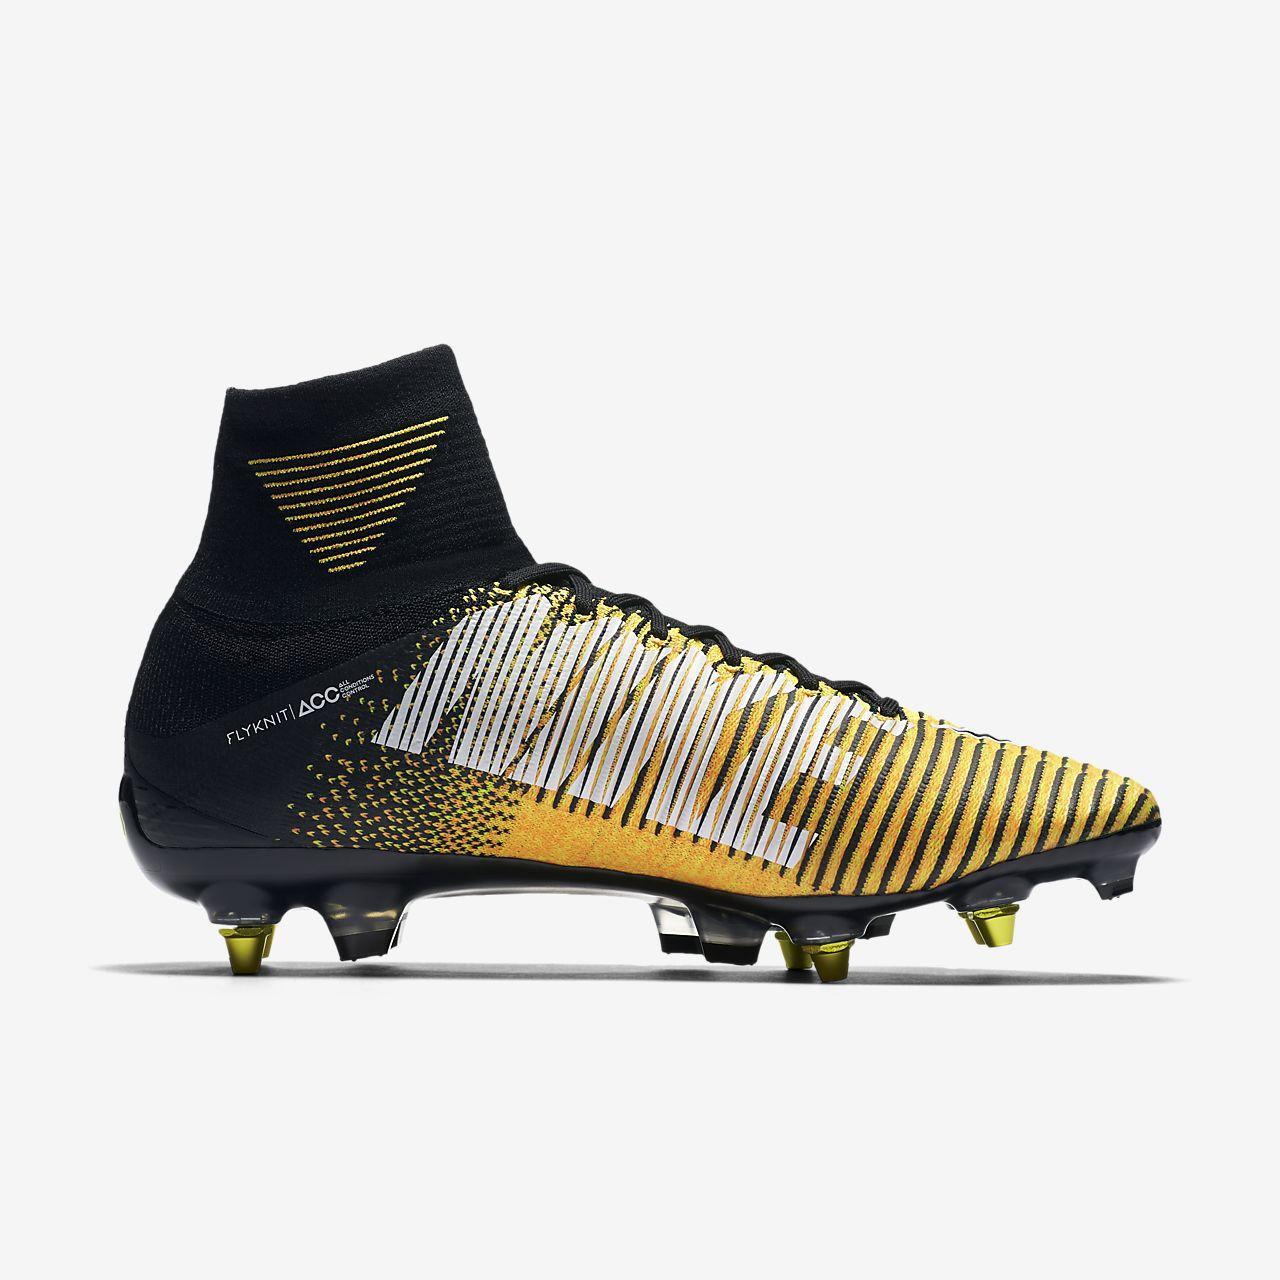 Nike Mercurial Superfly V Dynamic Fit SG PRO Anti Clog Botas de fútbol para terreno blando